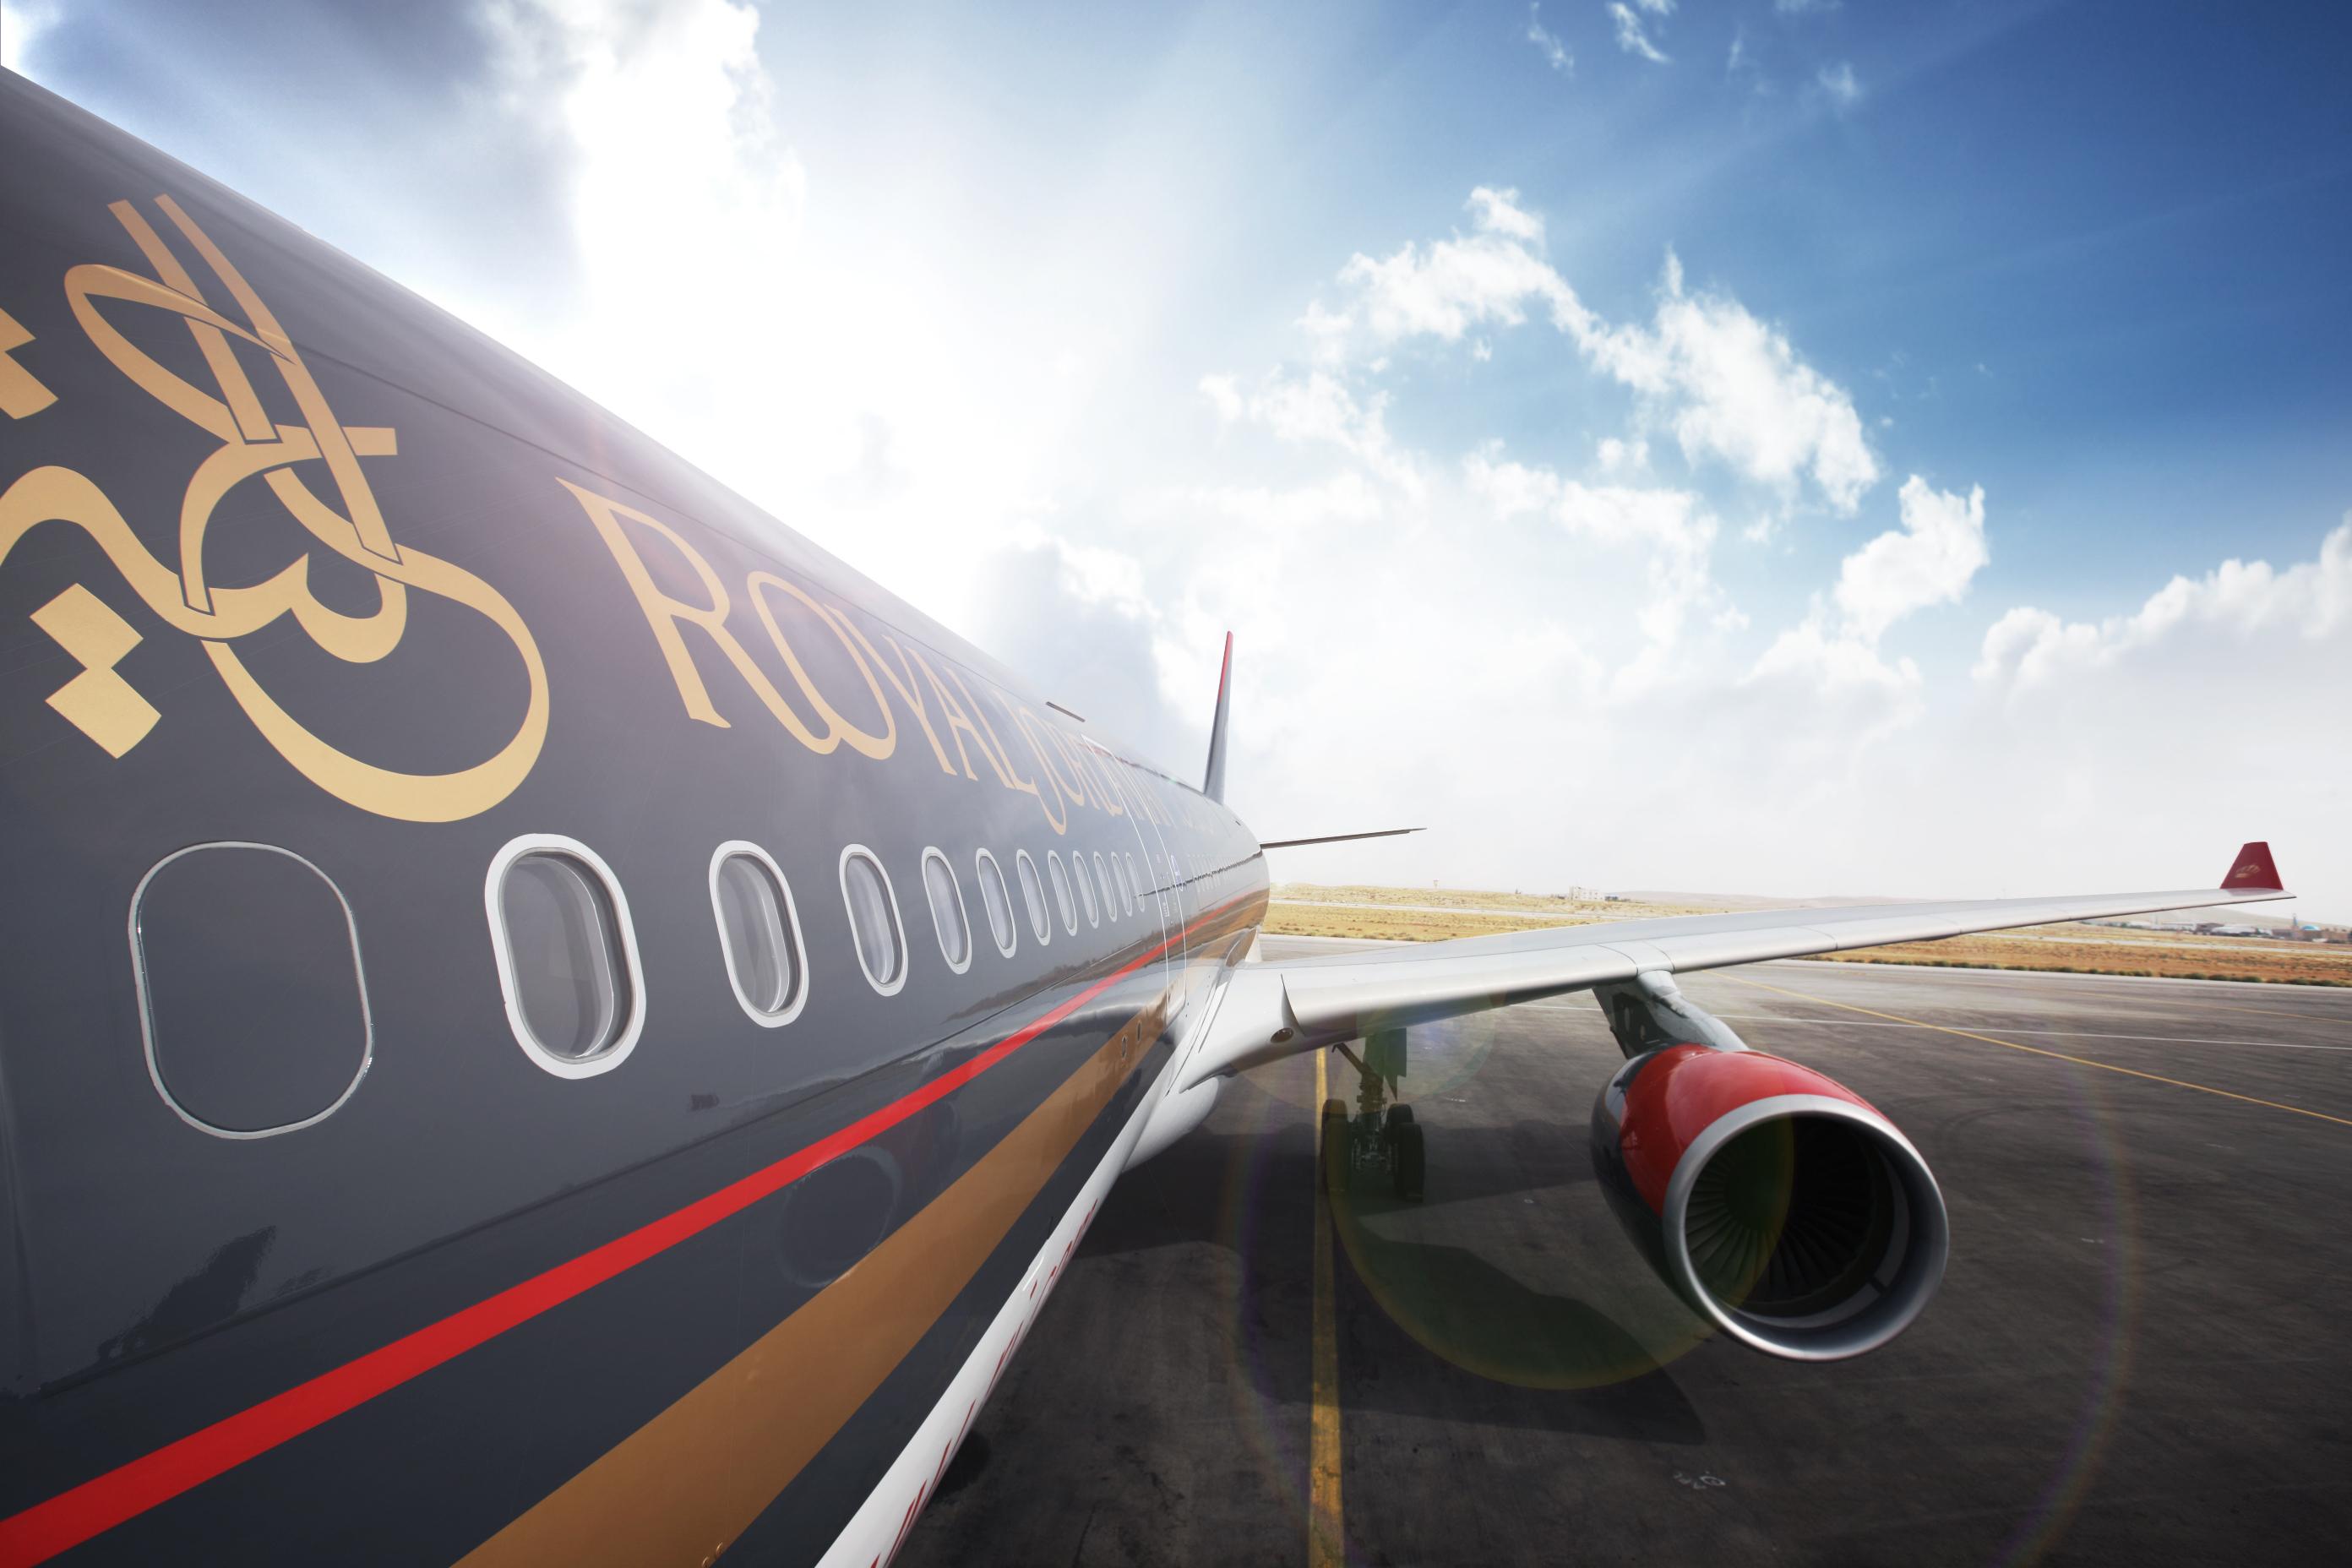 royal jordanian flight change